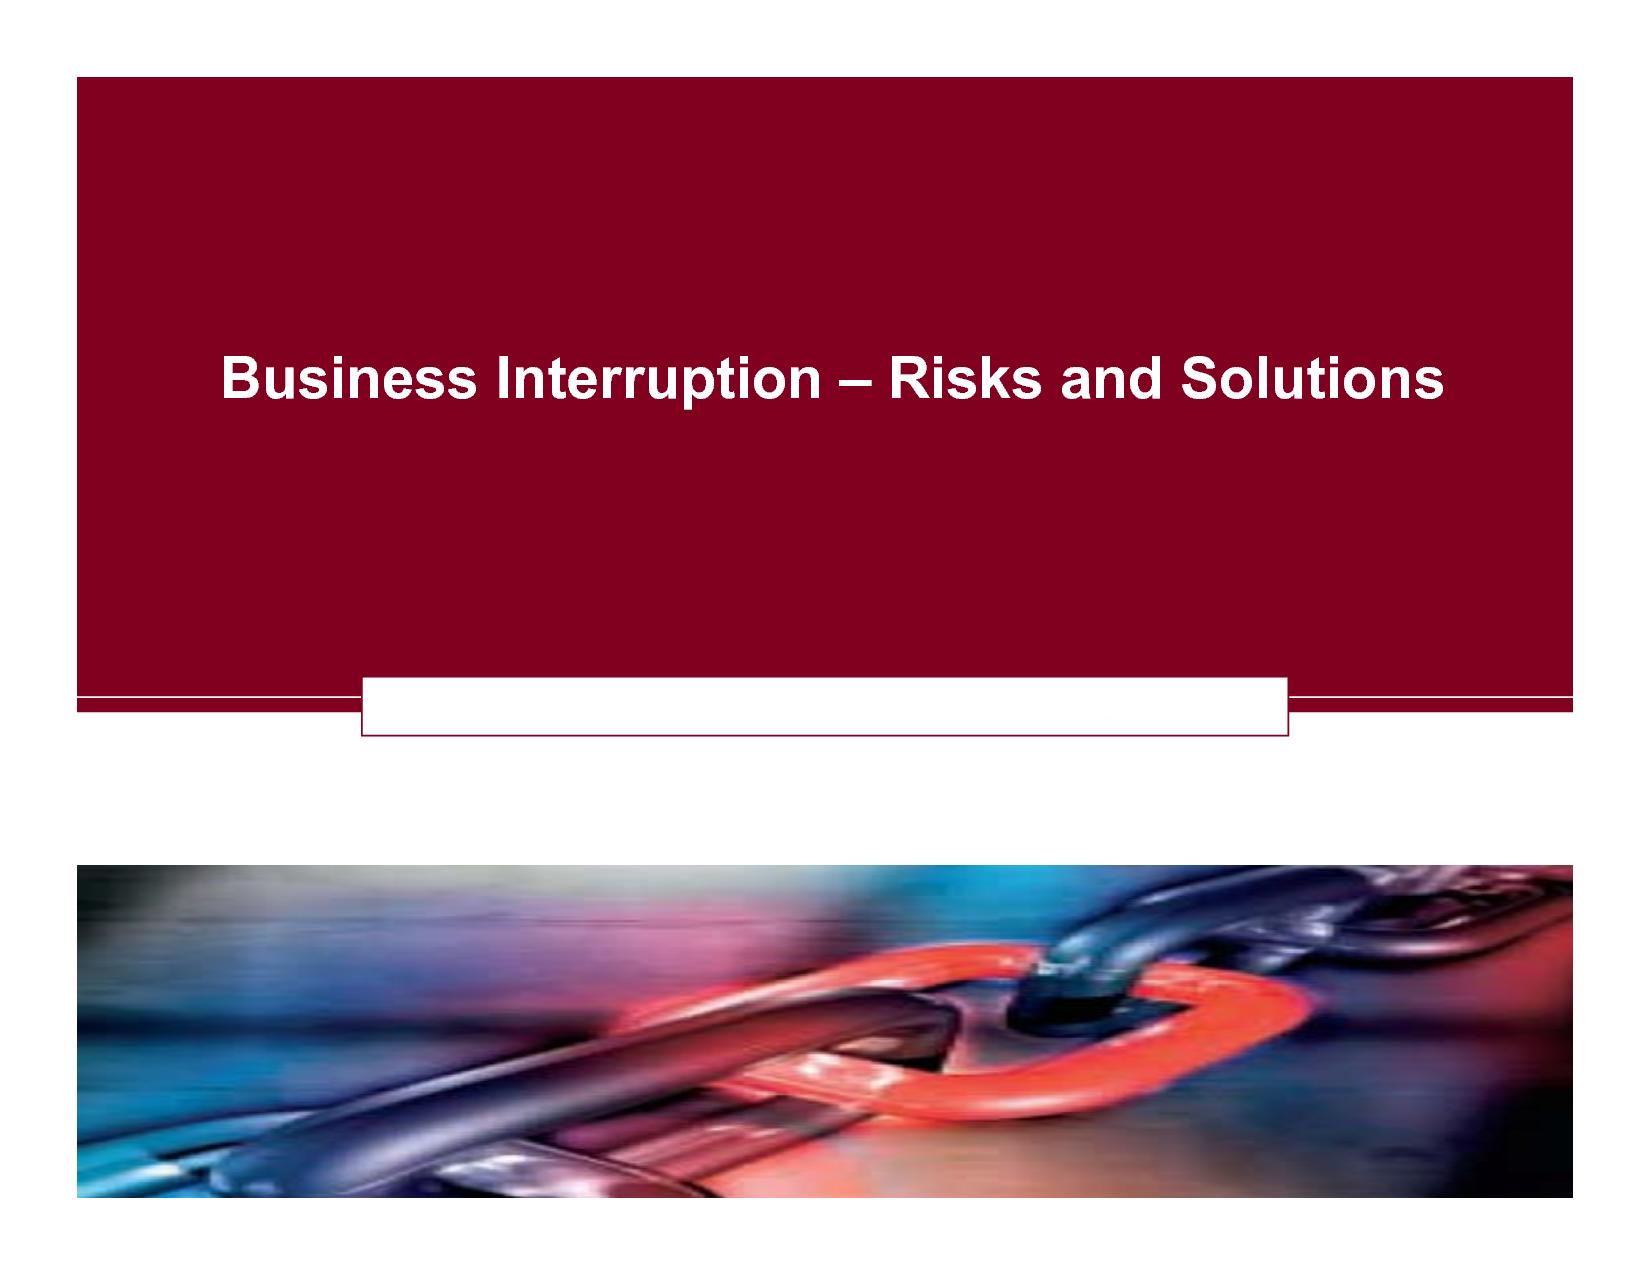 Homeownersinsurancefortlauderdale Business Interruption Insurance